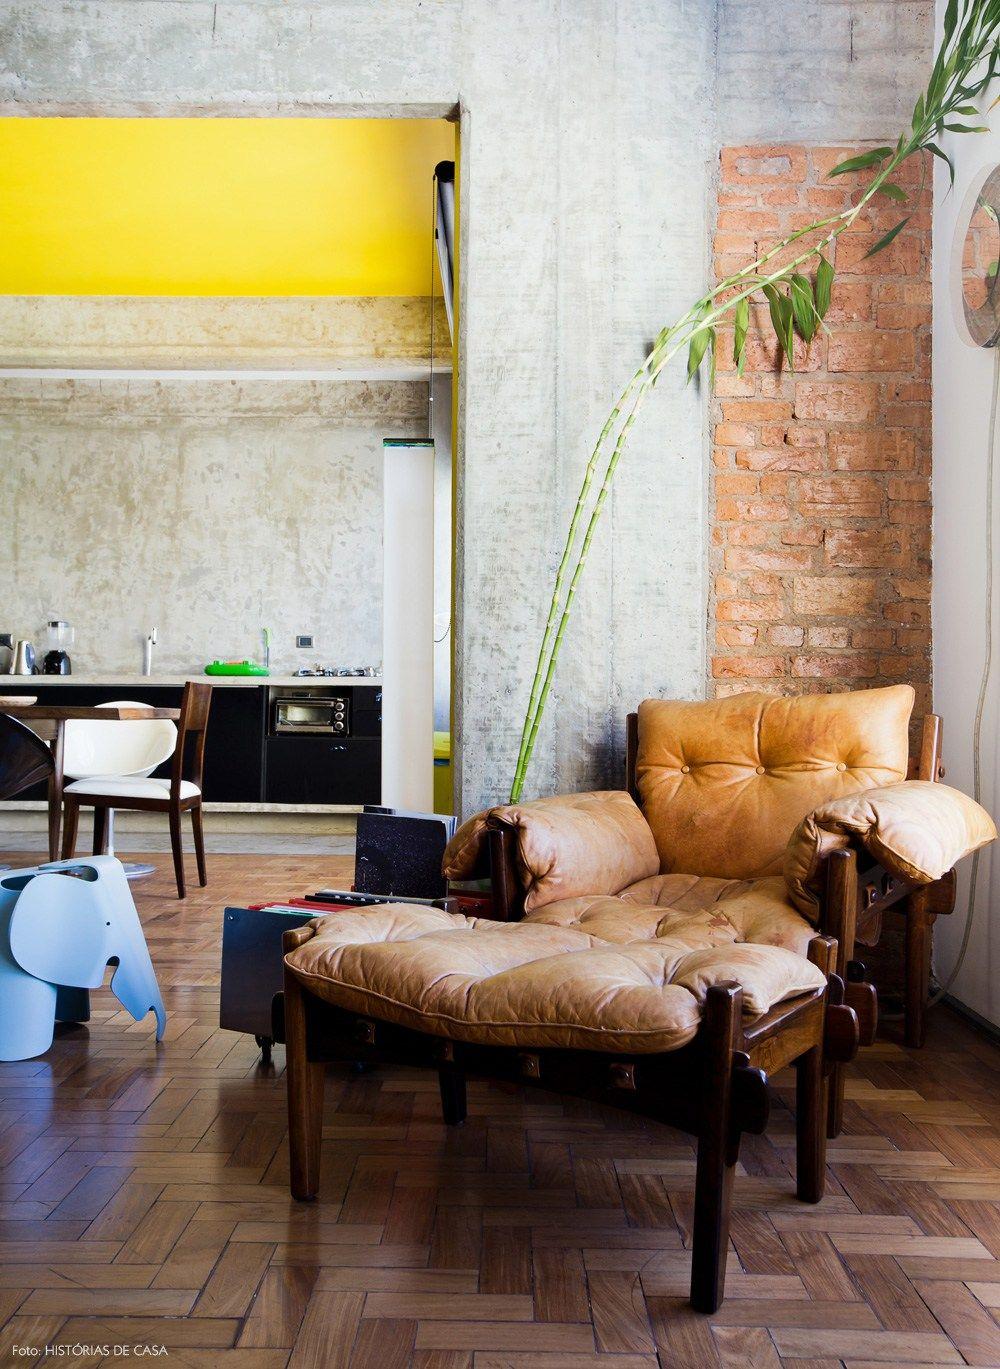 Laborat Rio De Ideias Inside Design Living Rooms And Architecture  -> Parede Da Sala Ideias